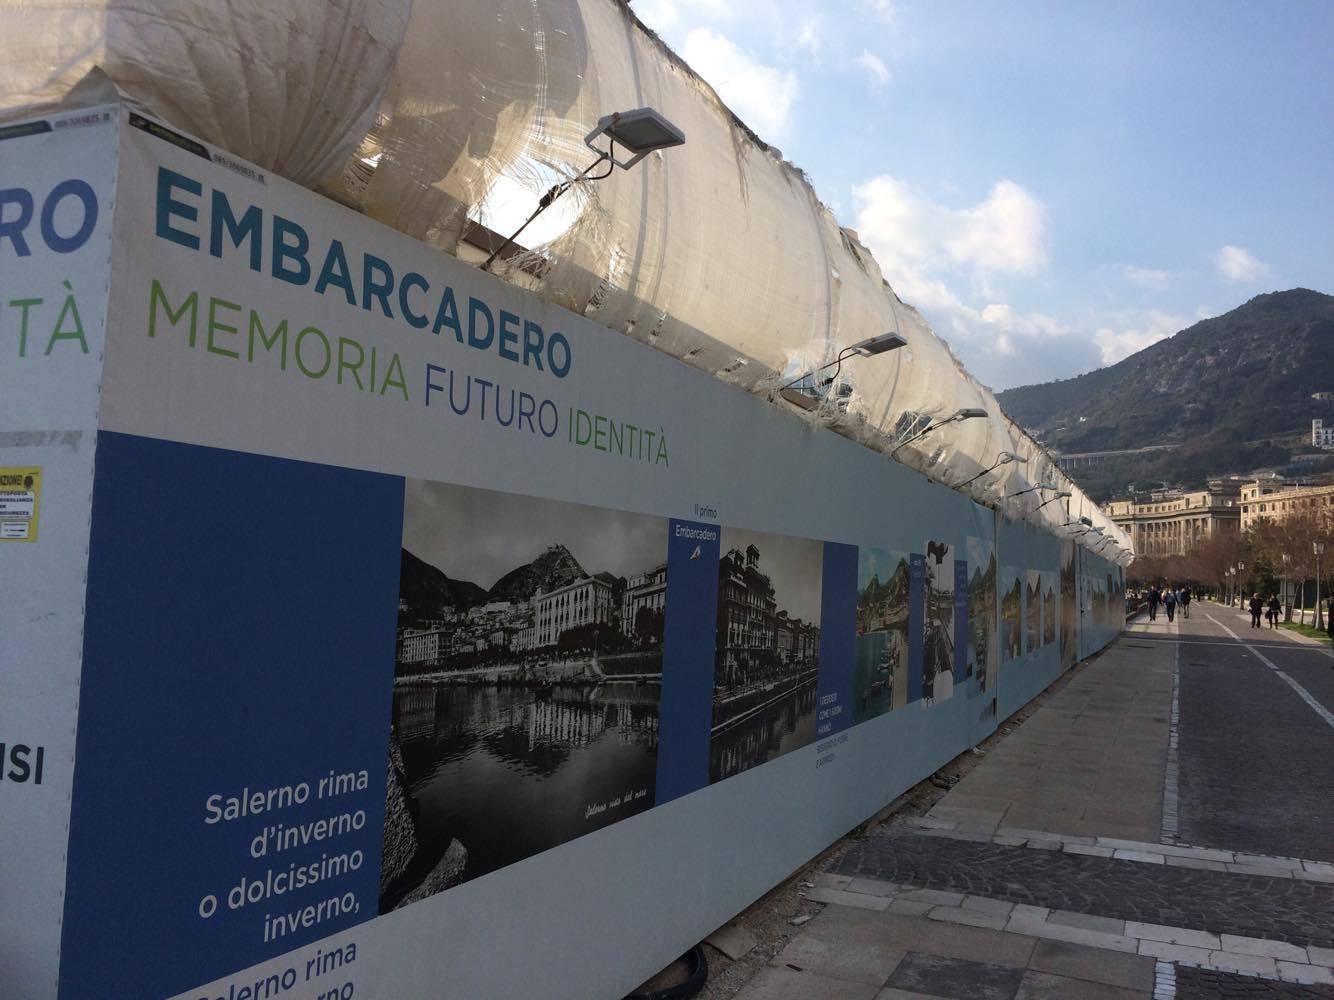 Feudi a Salerno Embarcardero